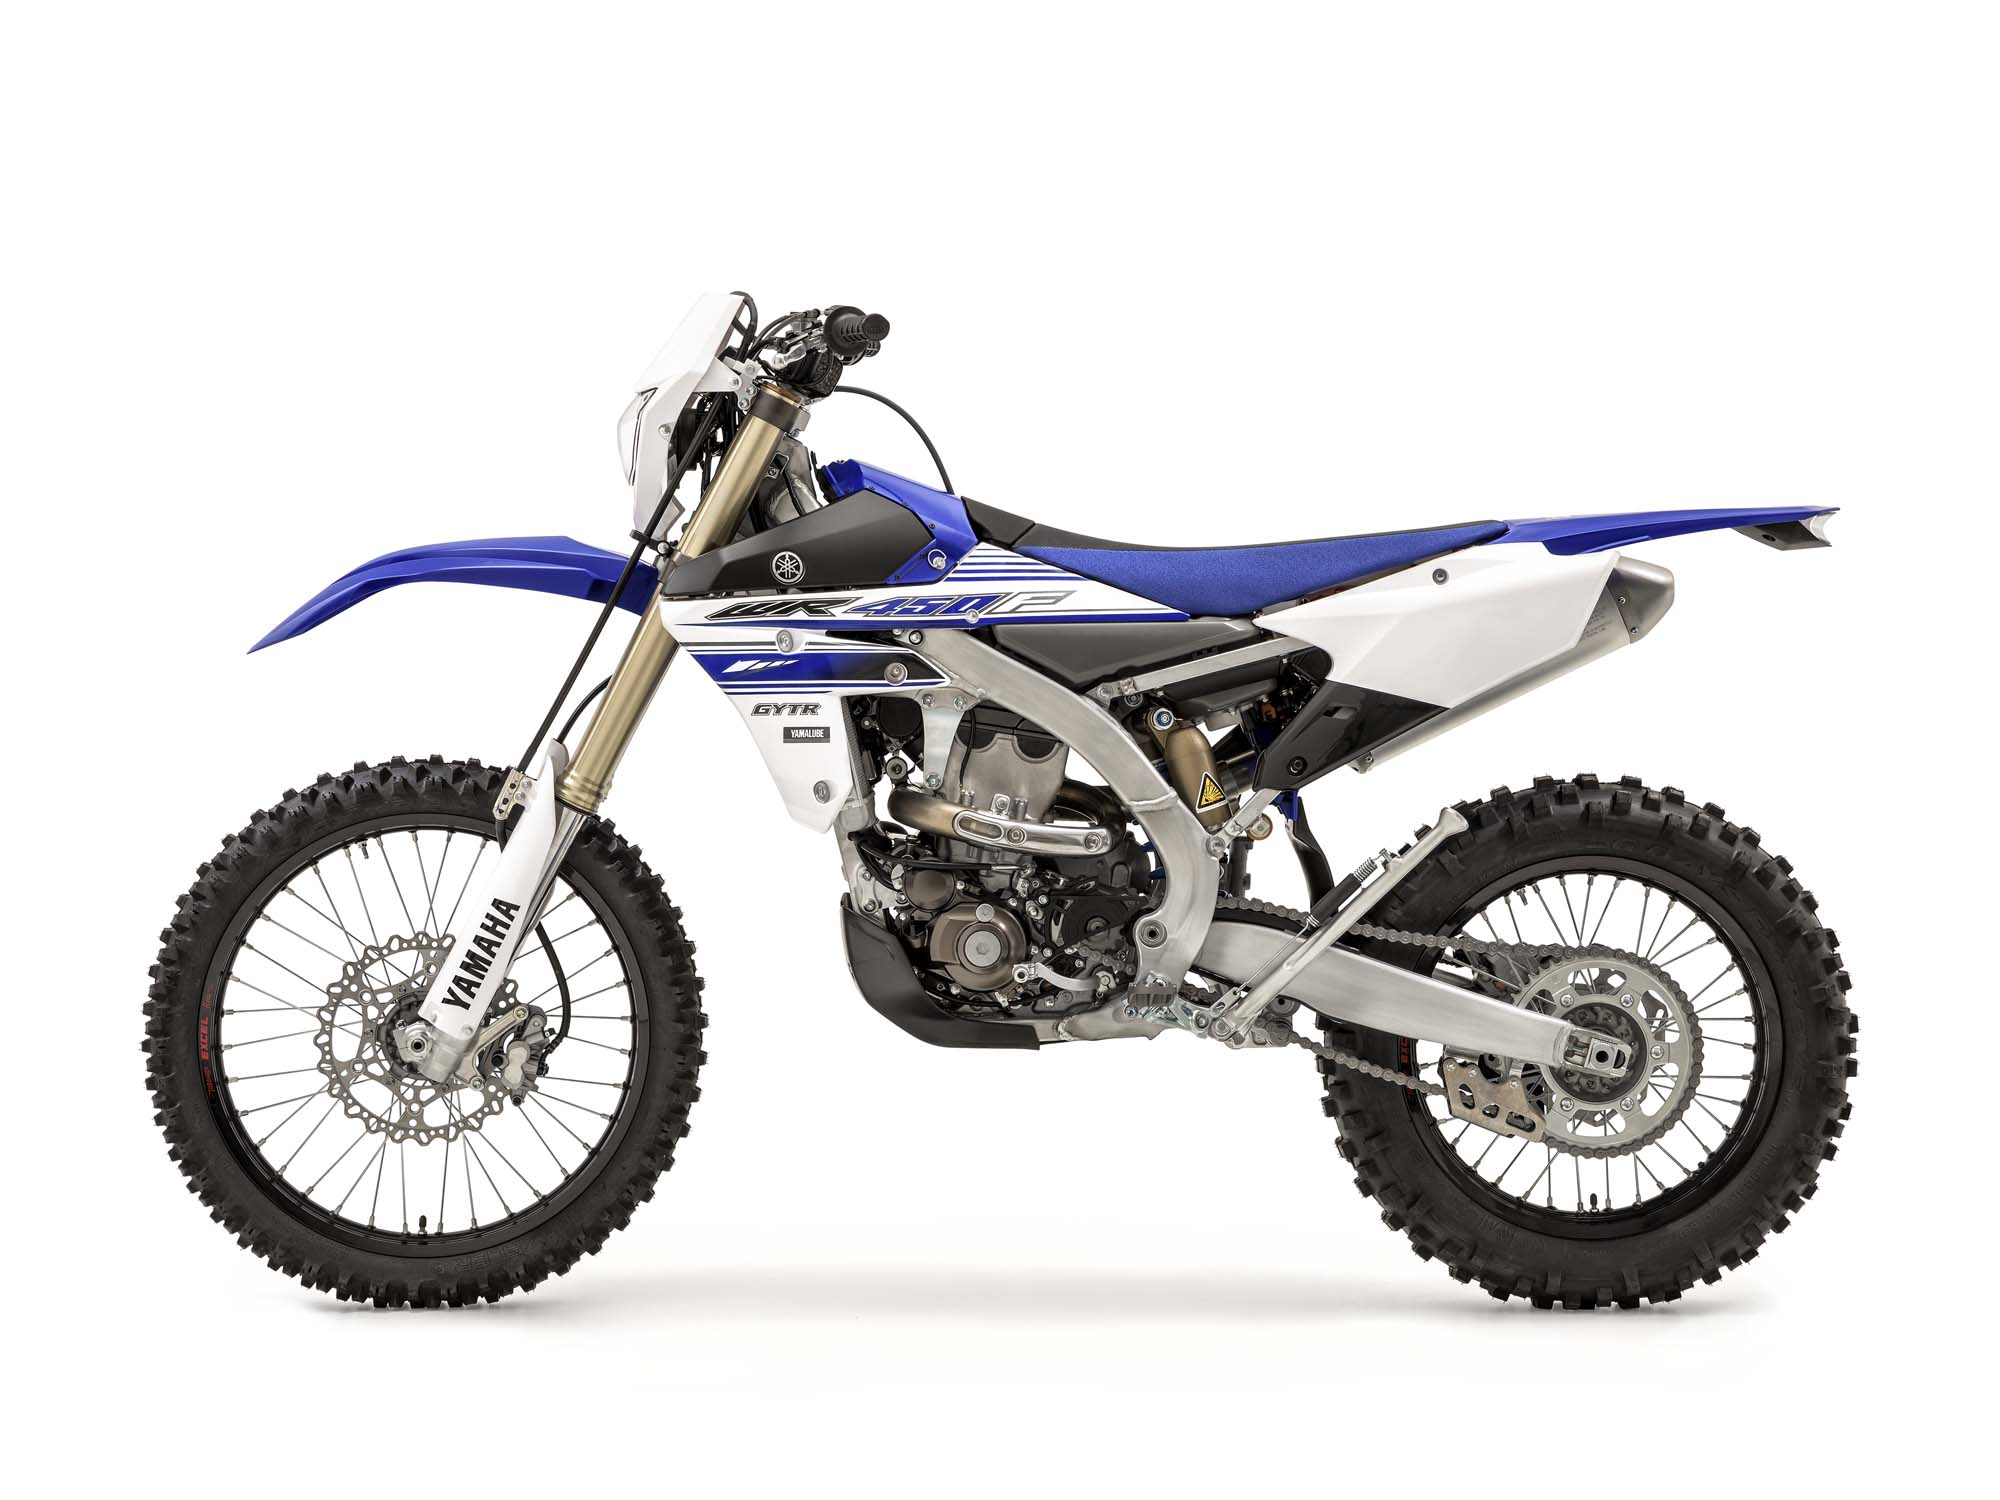 Neumotorrad: Yamaha WR 450 F , Baujahr: 2020, Preis: 8.890